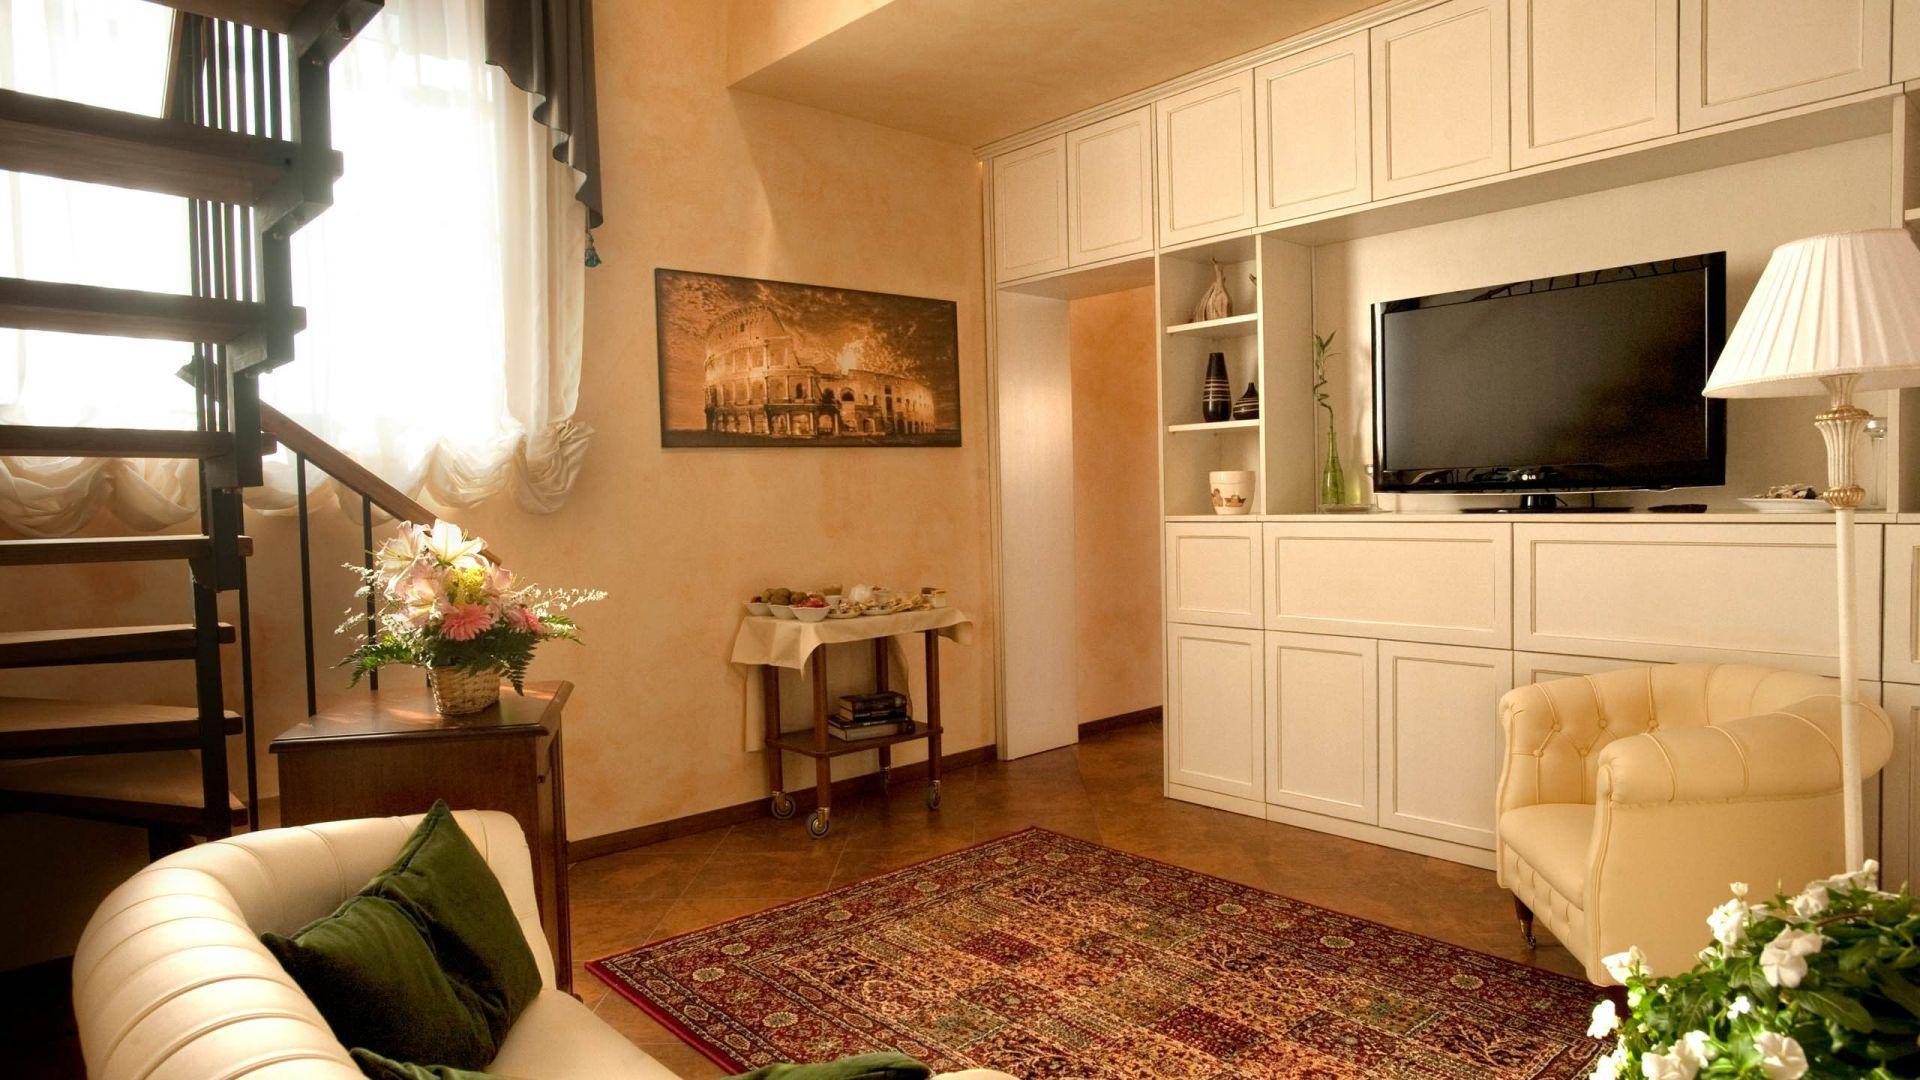 oc-casali-rome-rooms-04